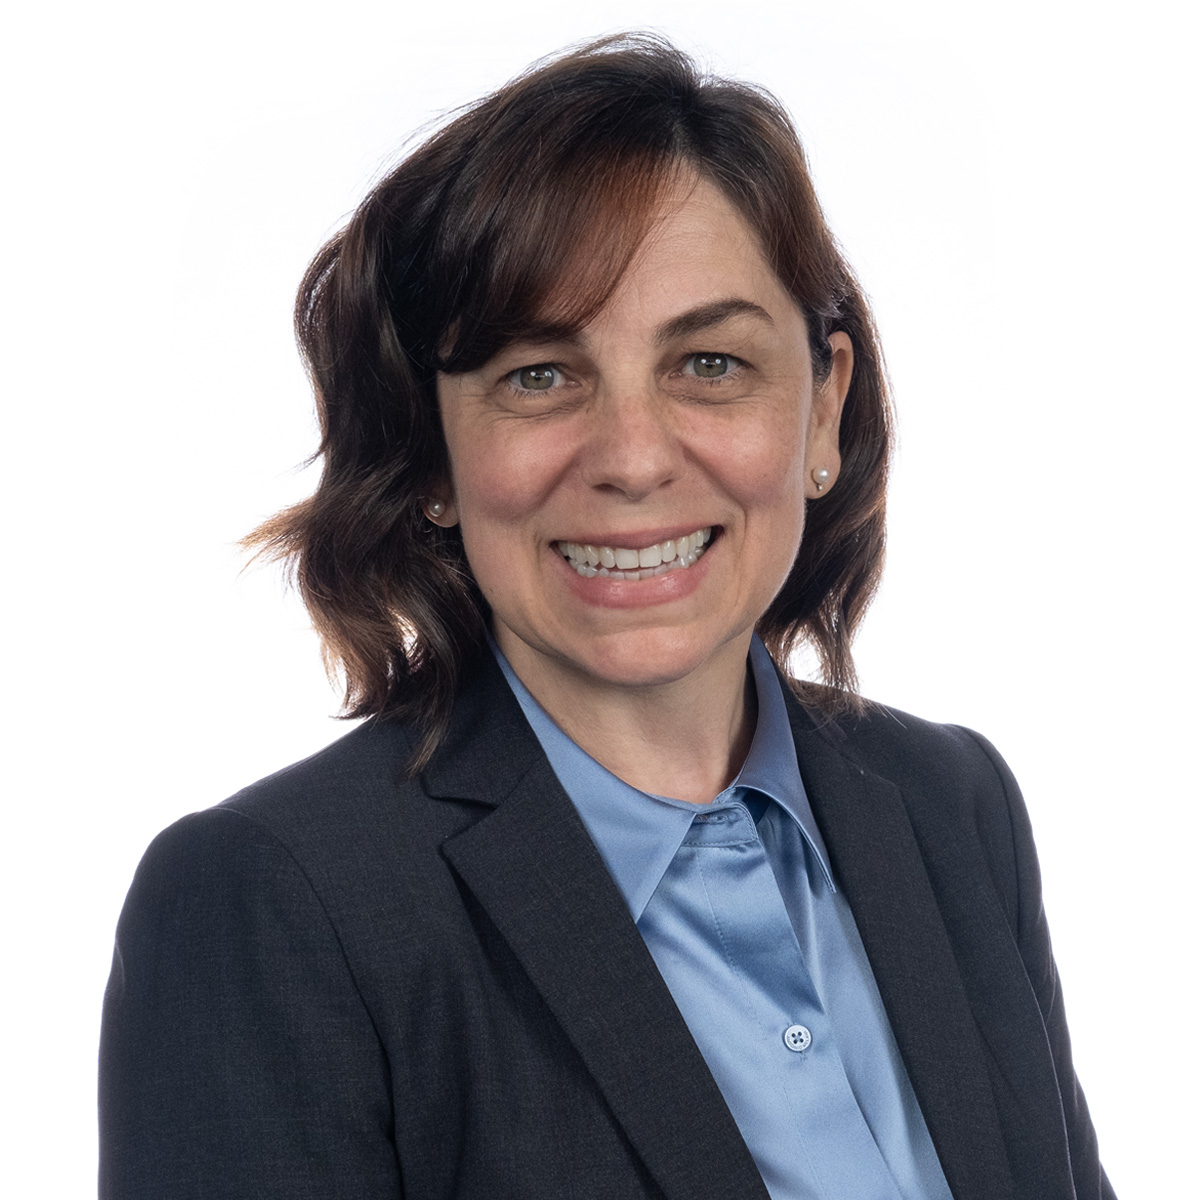 Sabrina Dobbins